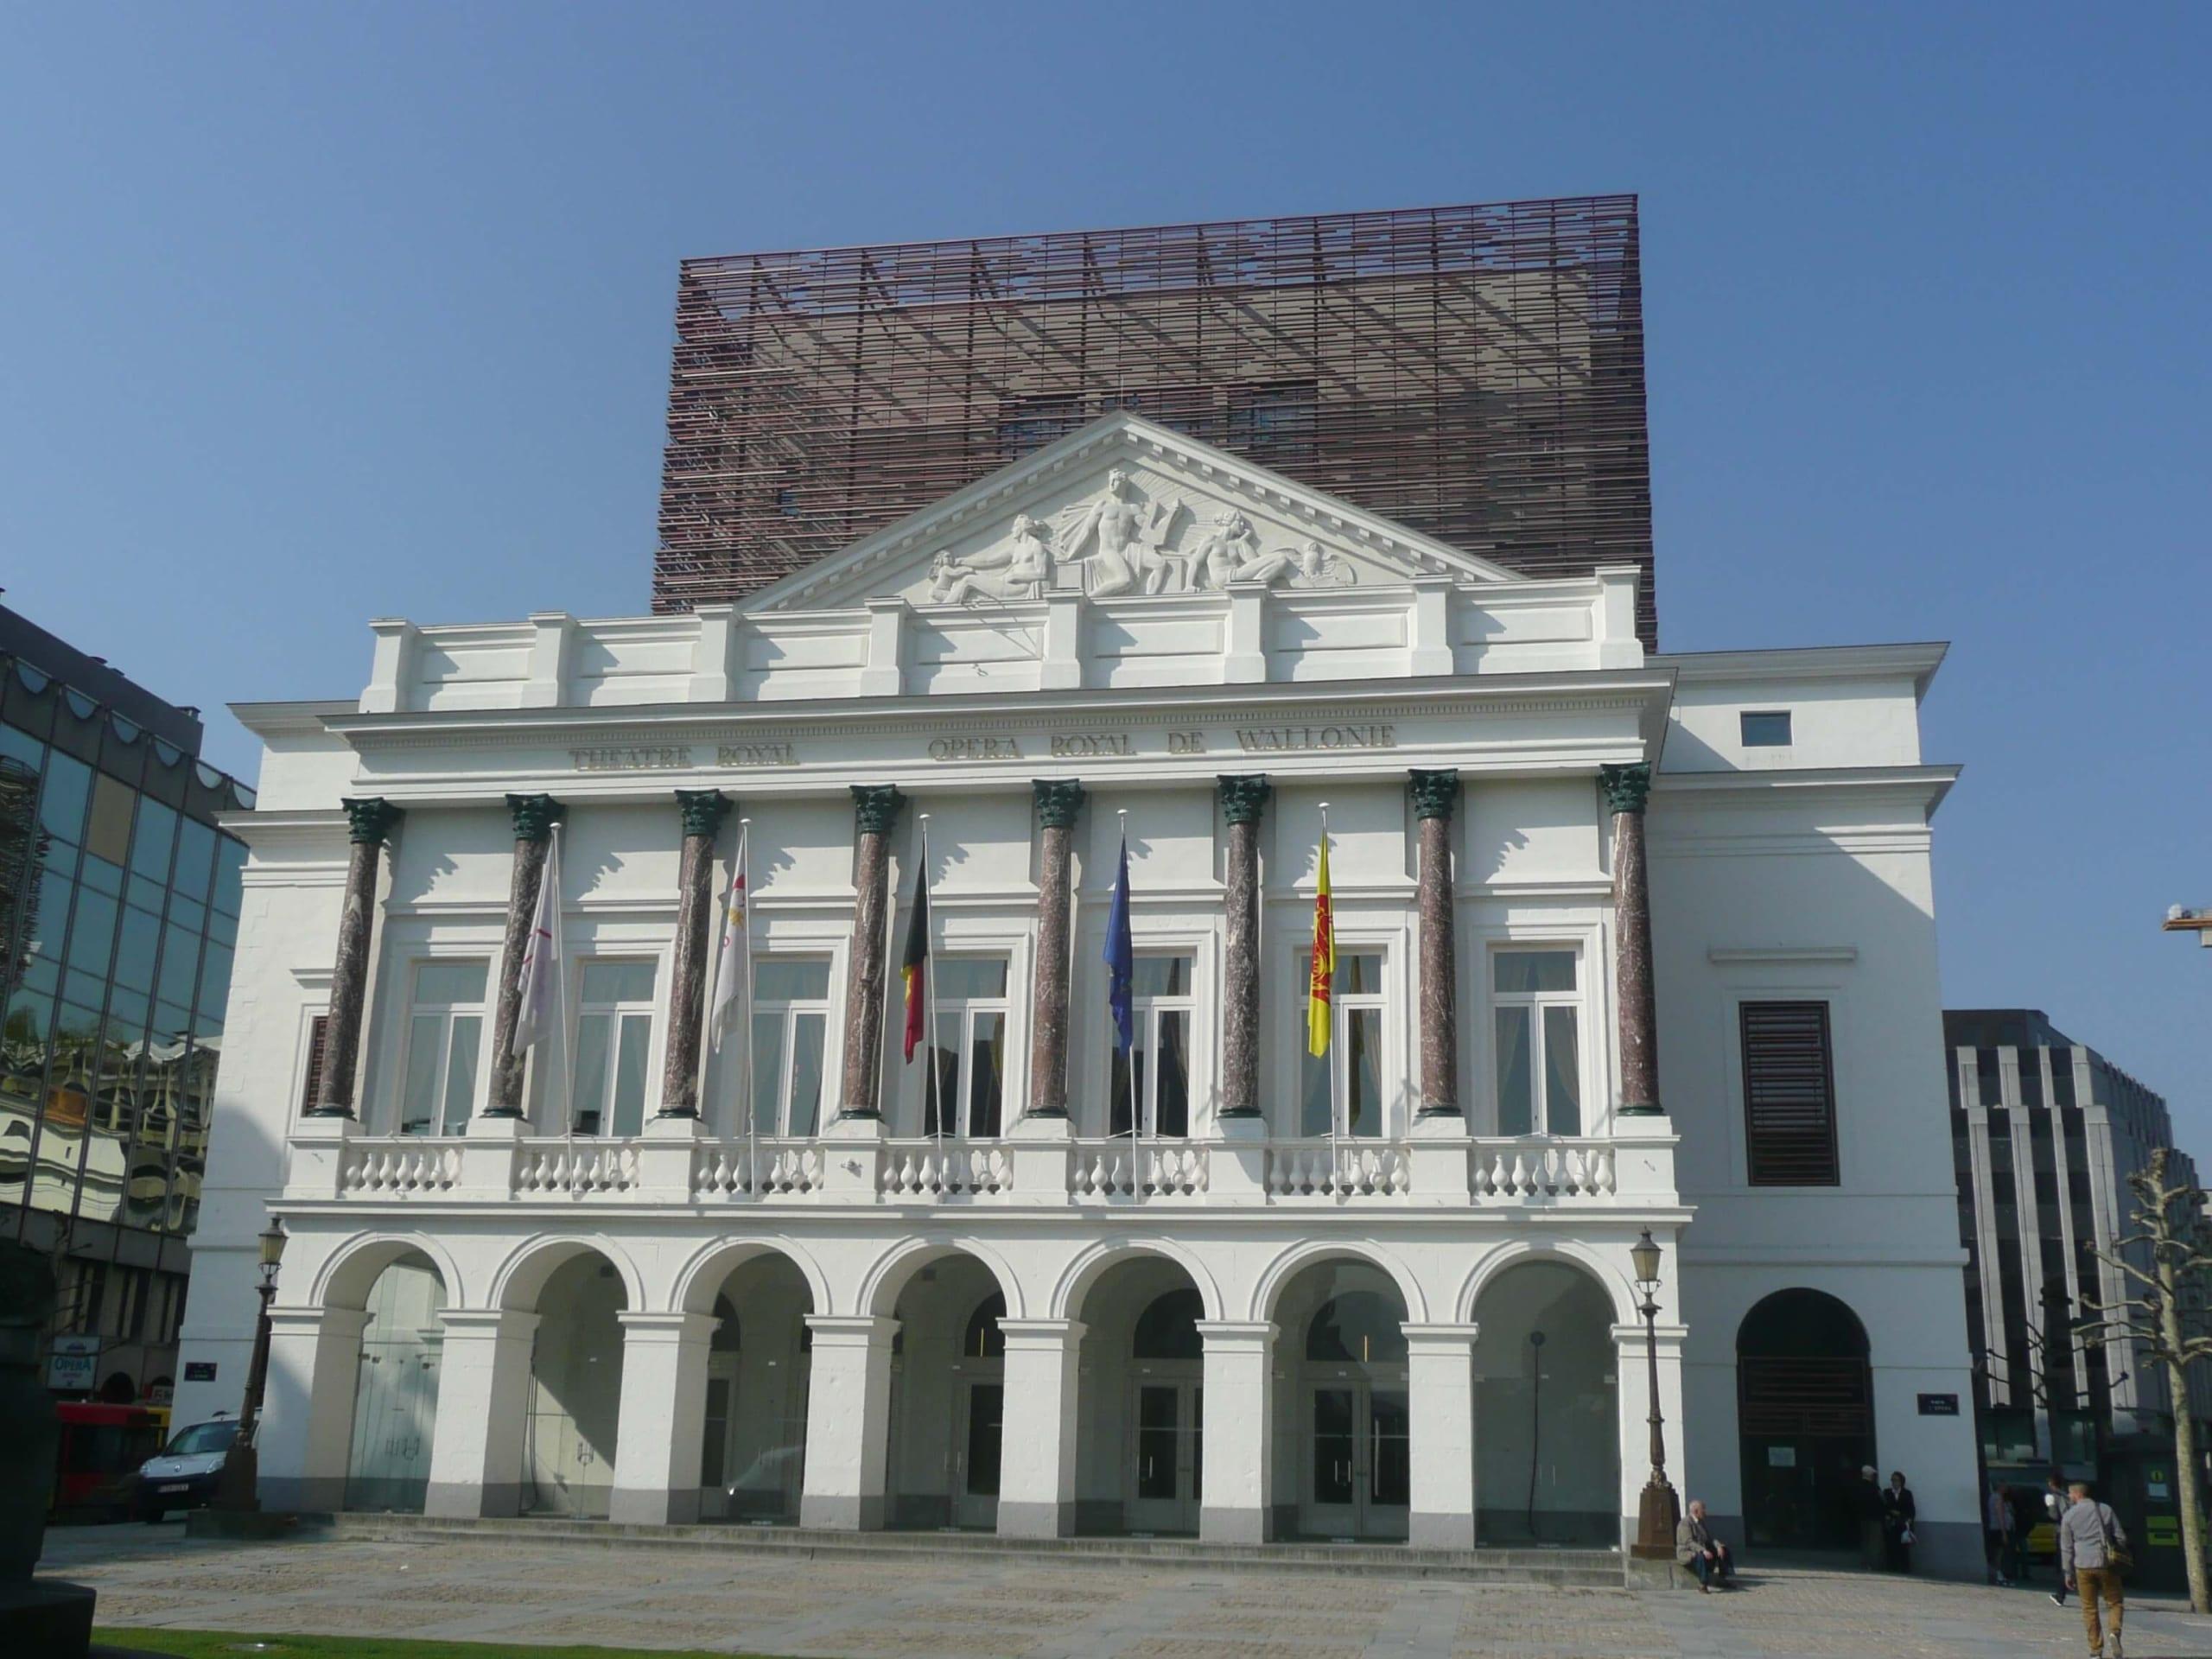 Spiralift at Théâtre Royal de Liège